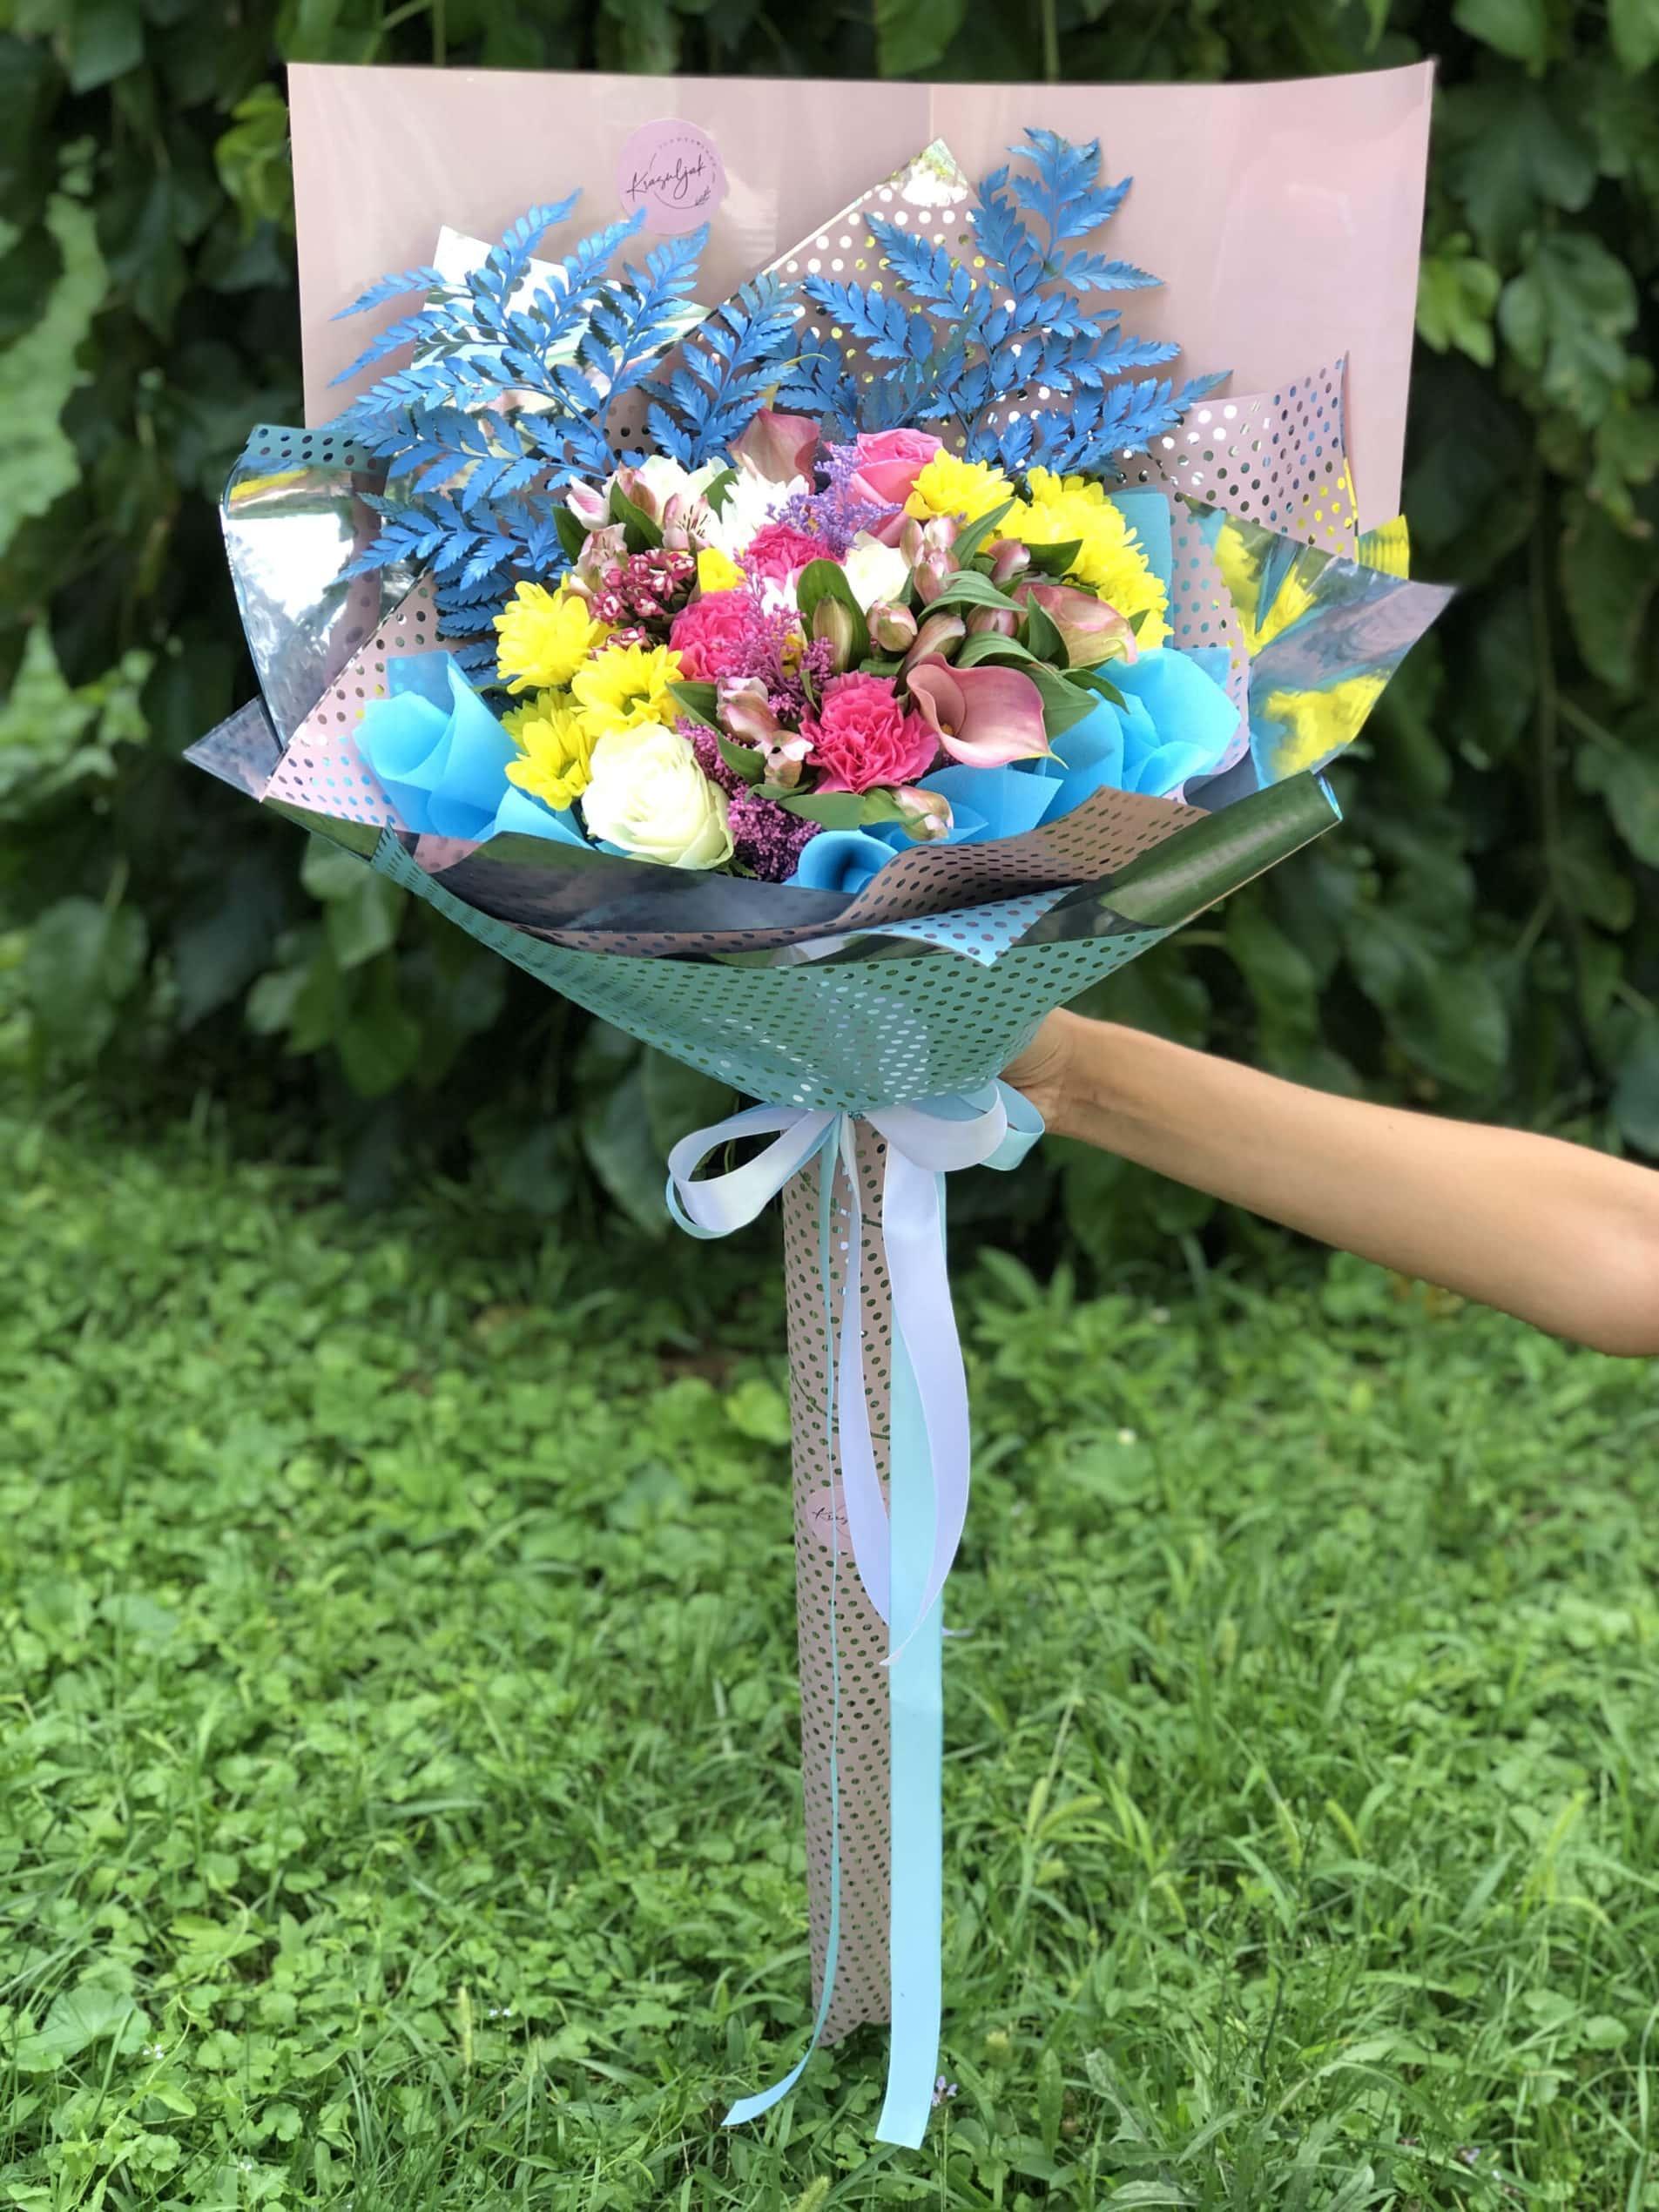 Cveće - šareno cveće u ukrasnom papiru. Buket cveća